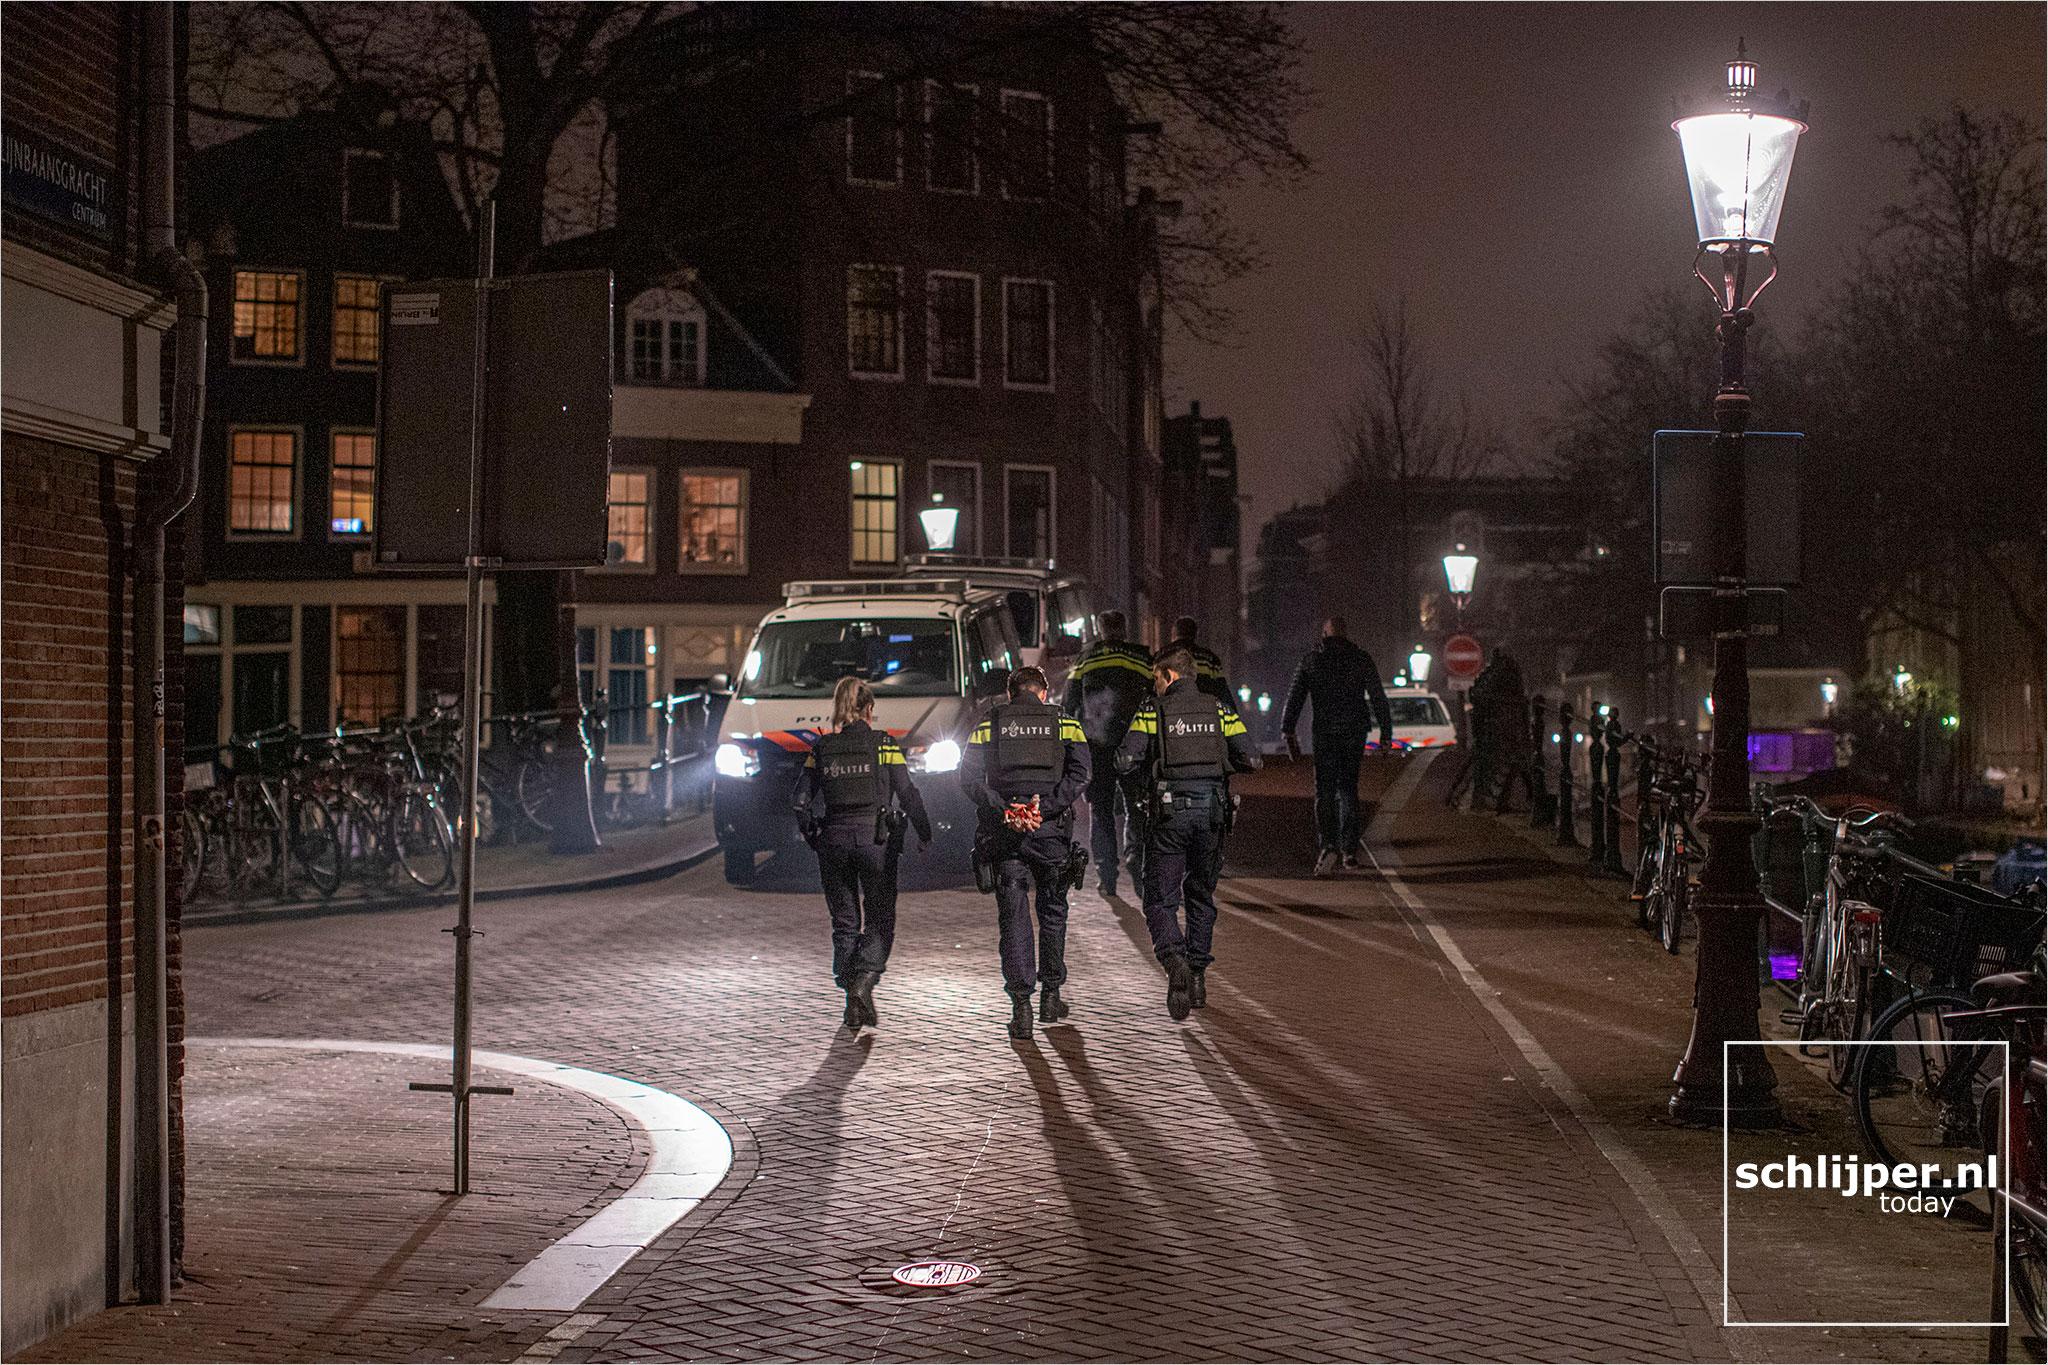 The Netherlands, Amsterdam, 28 februari 2021